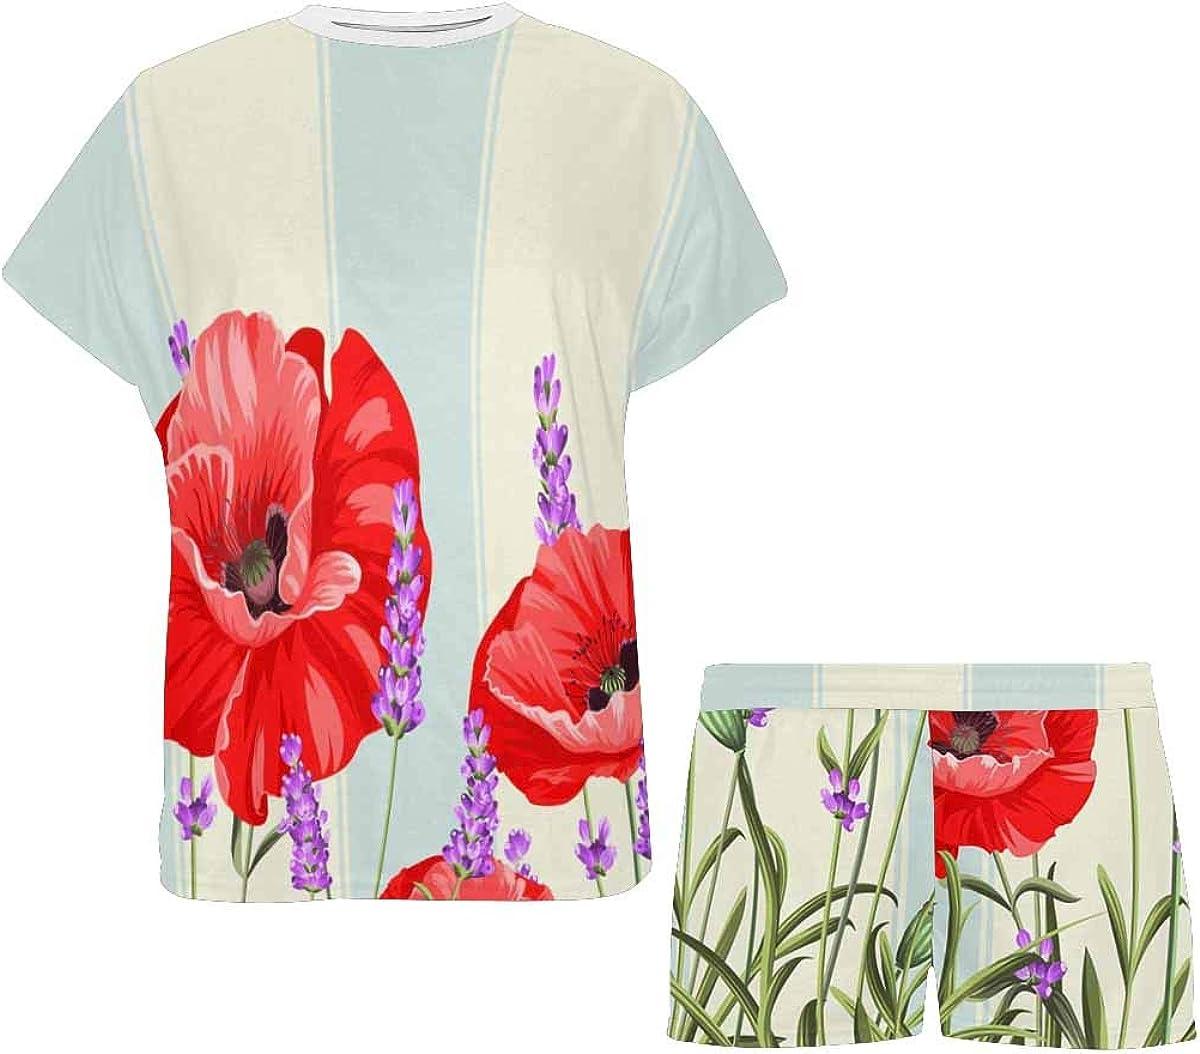 InterestPrint Poppy Flowers Over White Background Women's Pajamas Short Sets Round Neck Short Sleeve Sleepwear